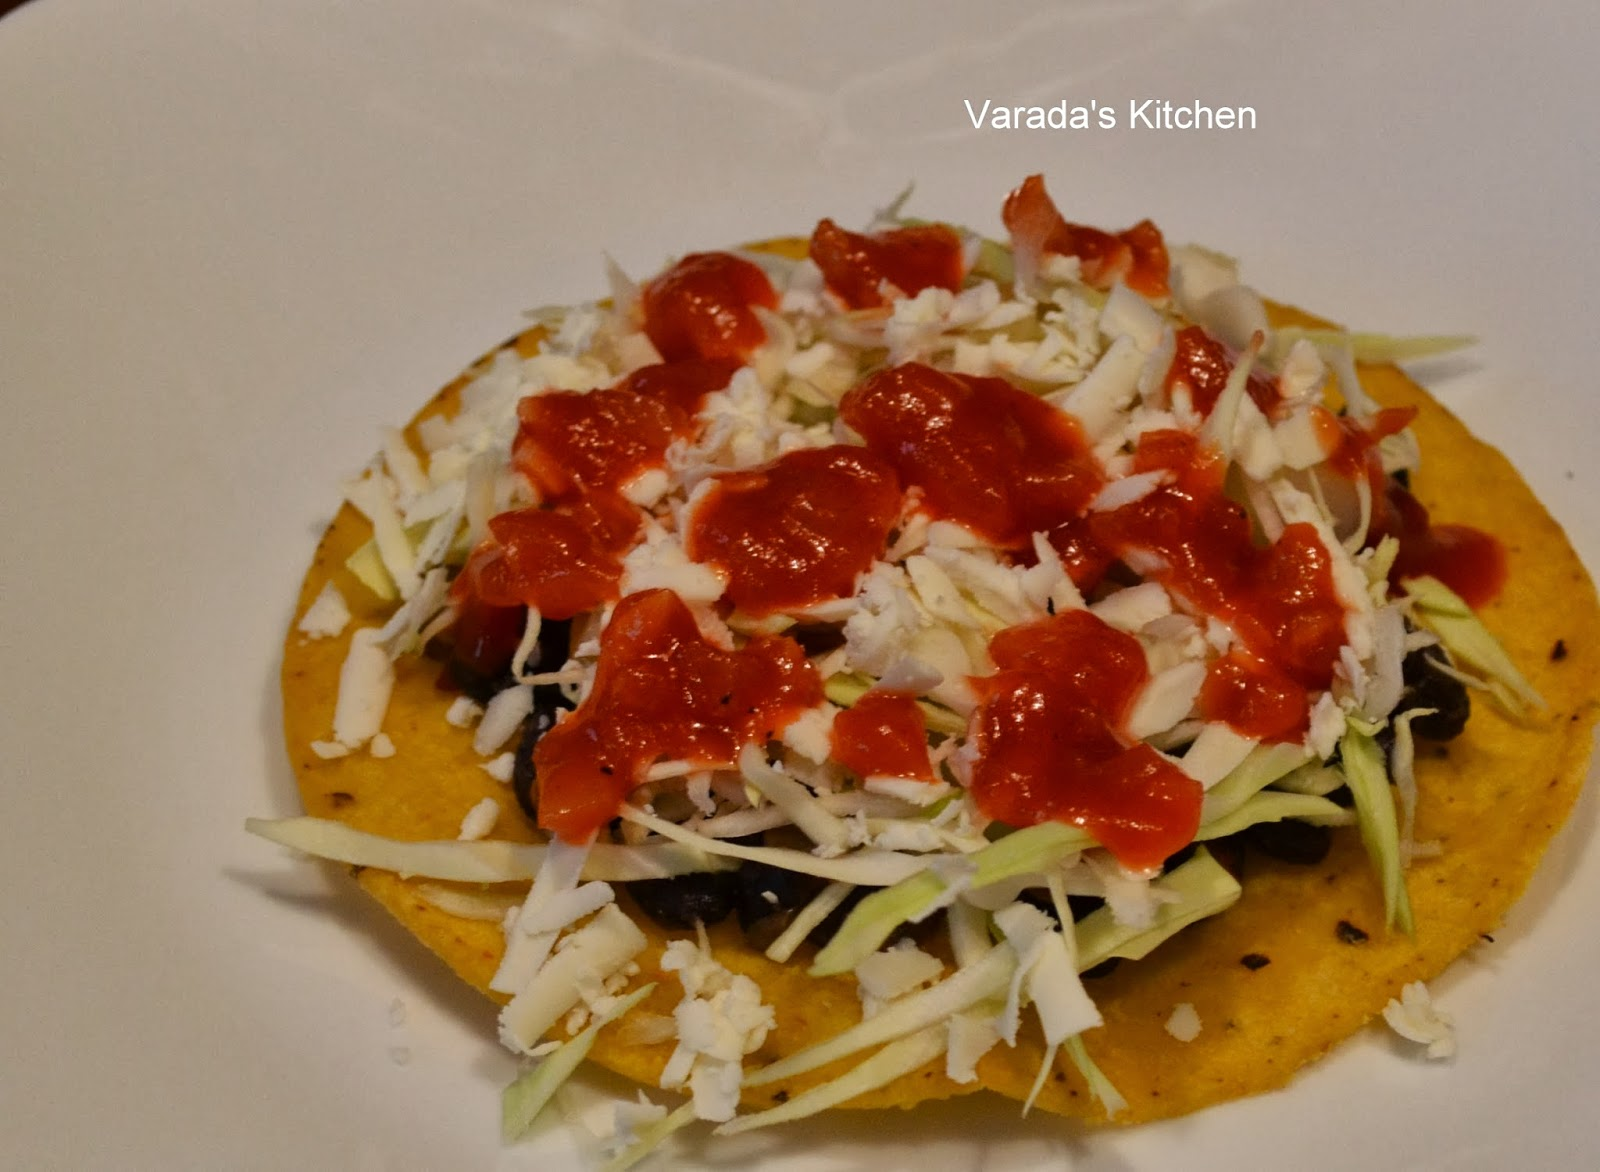 Varada's Kitchen: Honduran Enchiladas